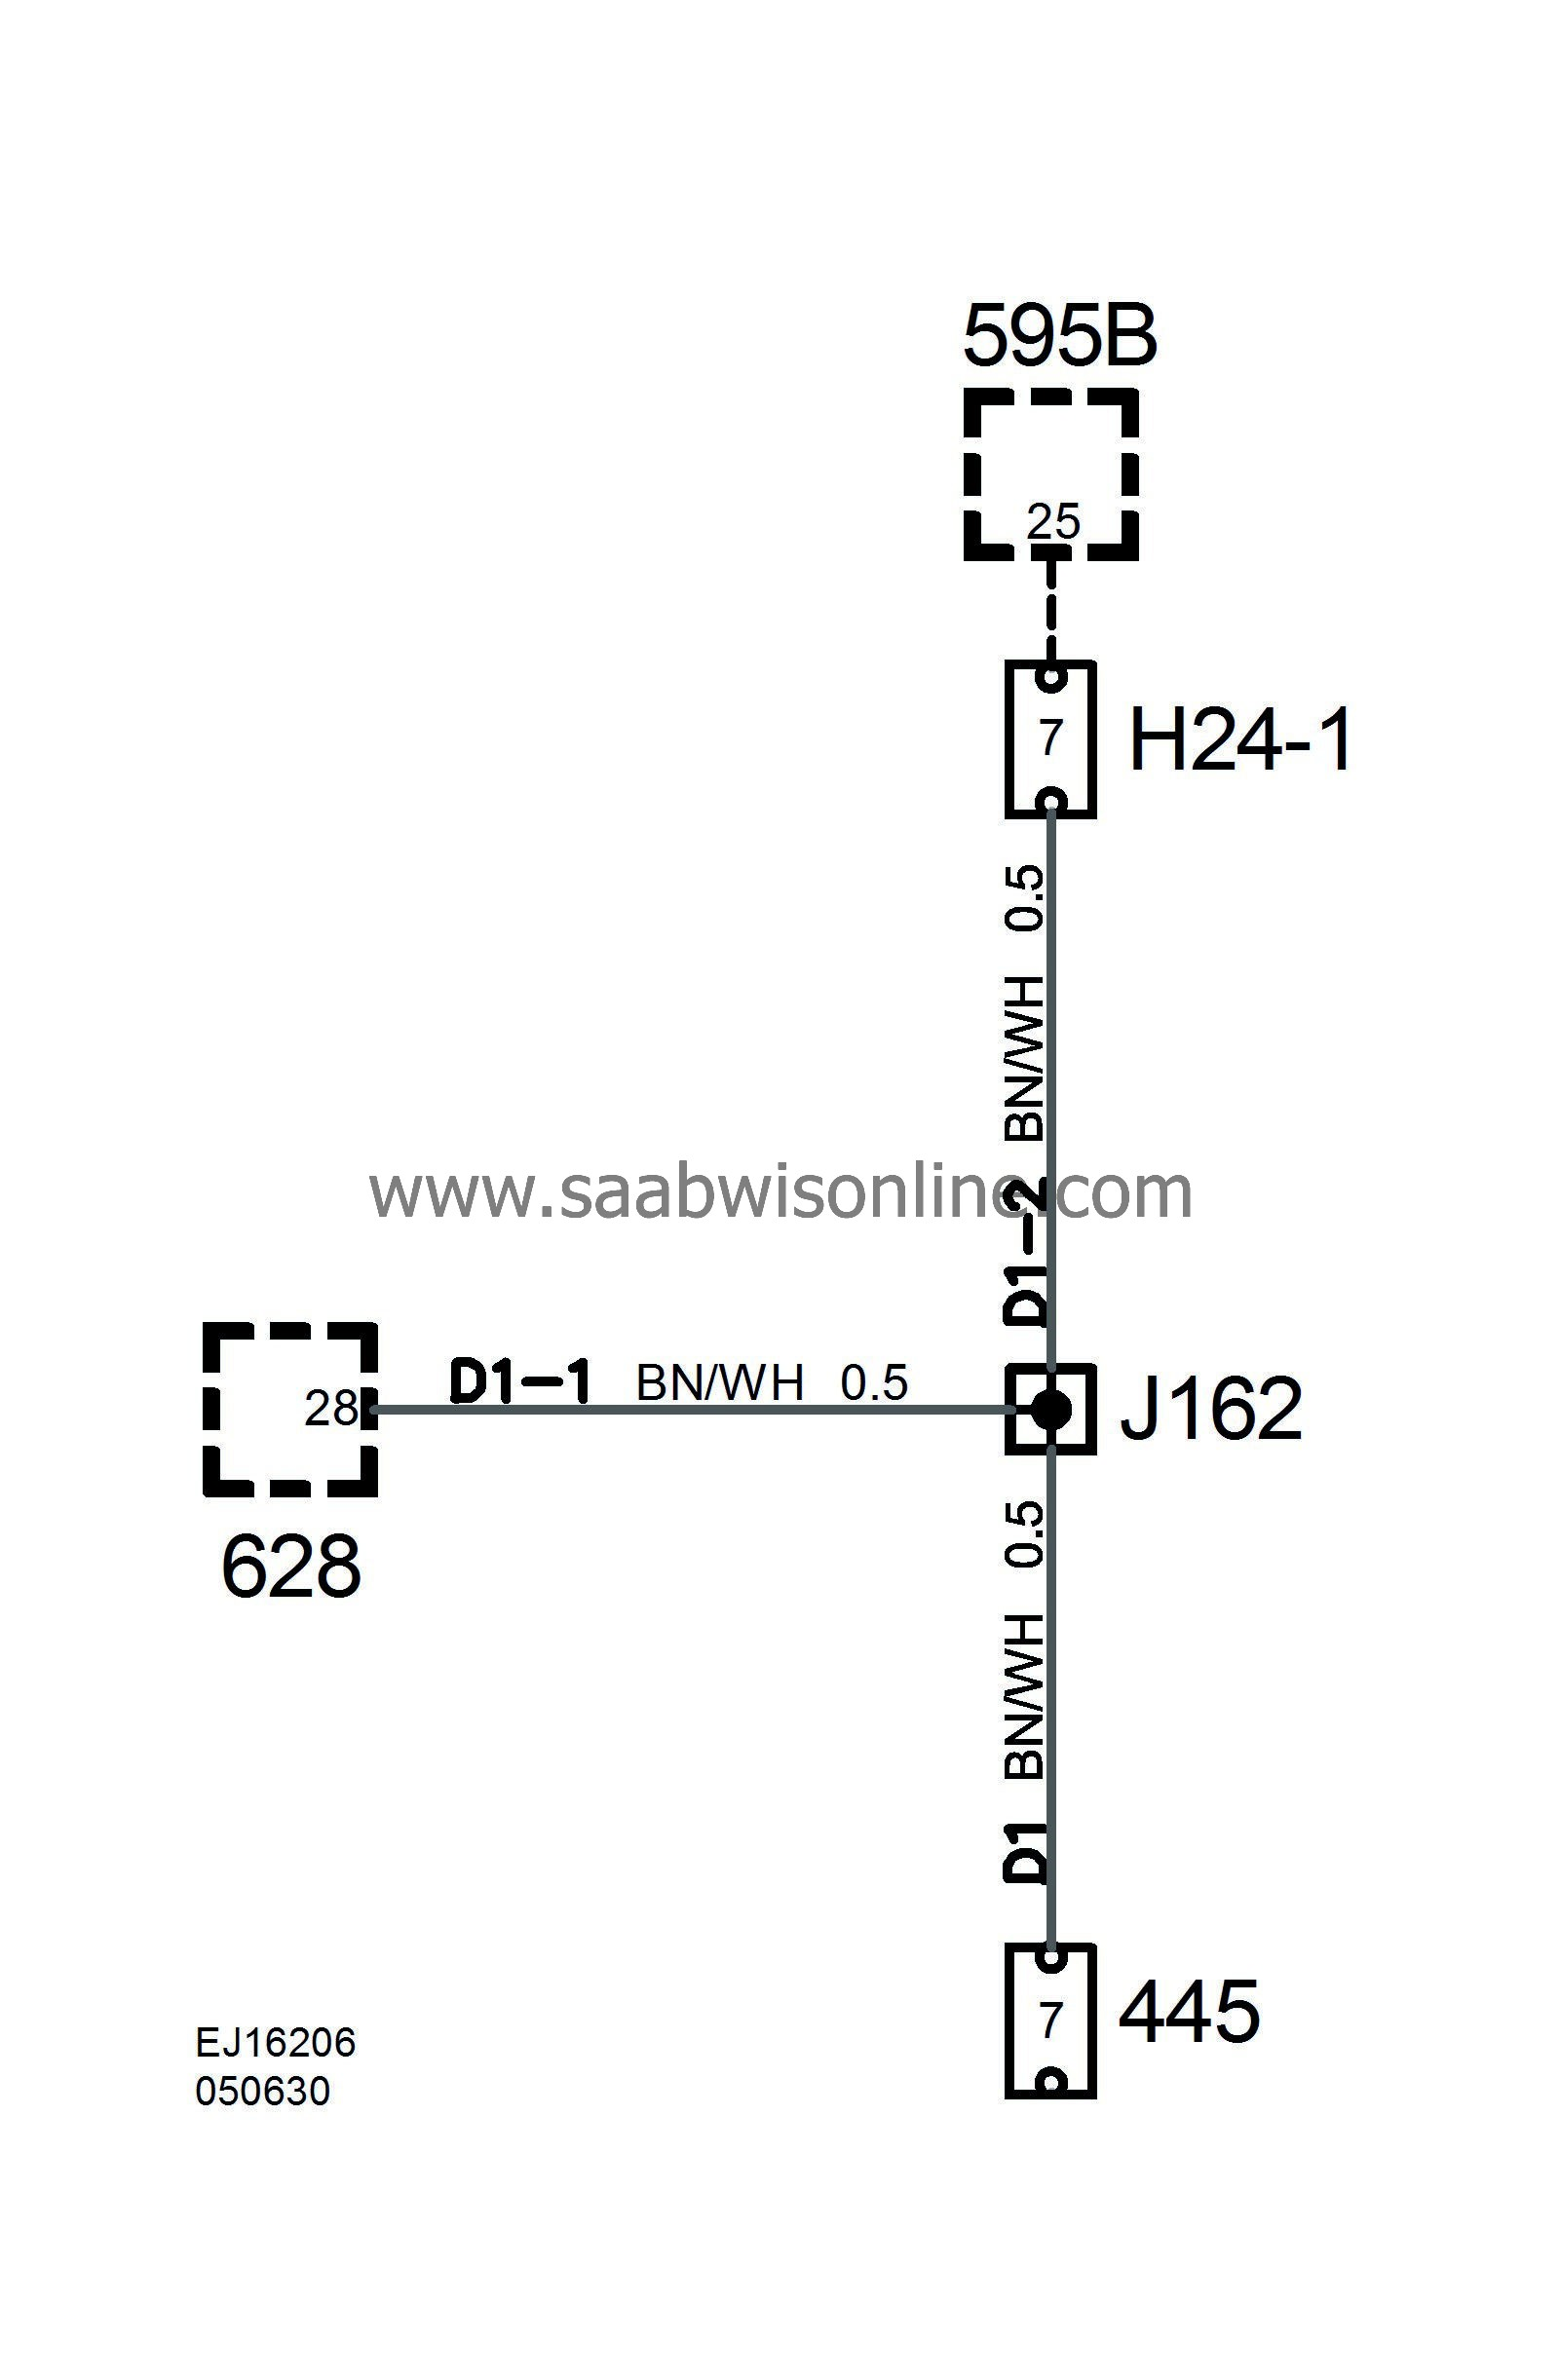 Crimp connection J162, instrument wiring harness